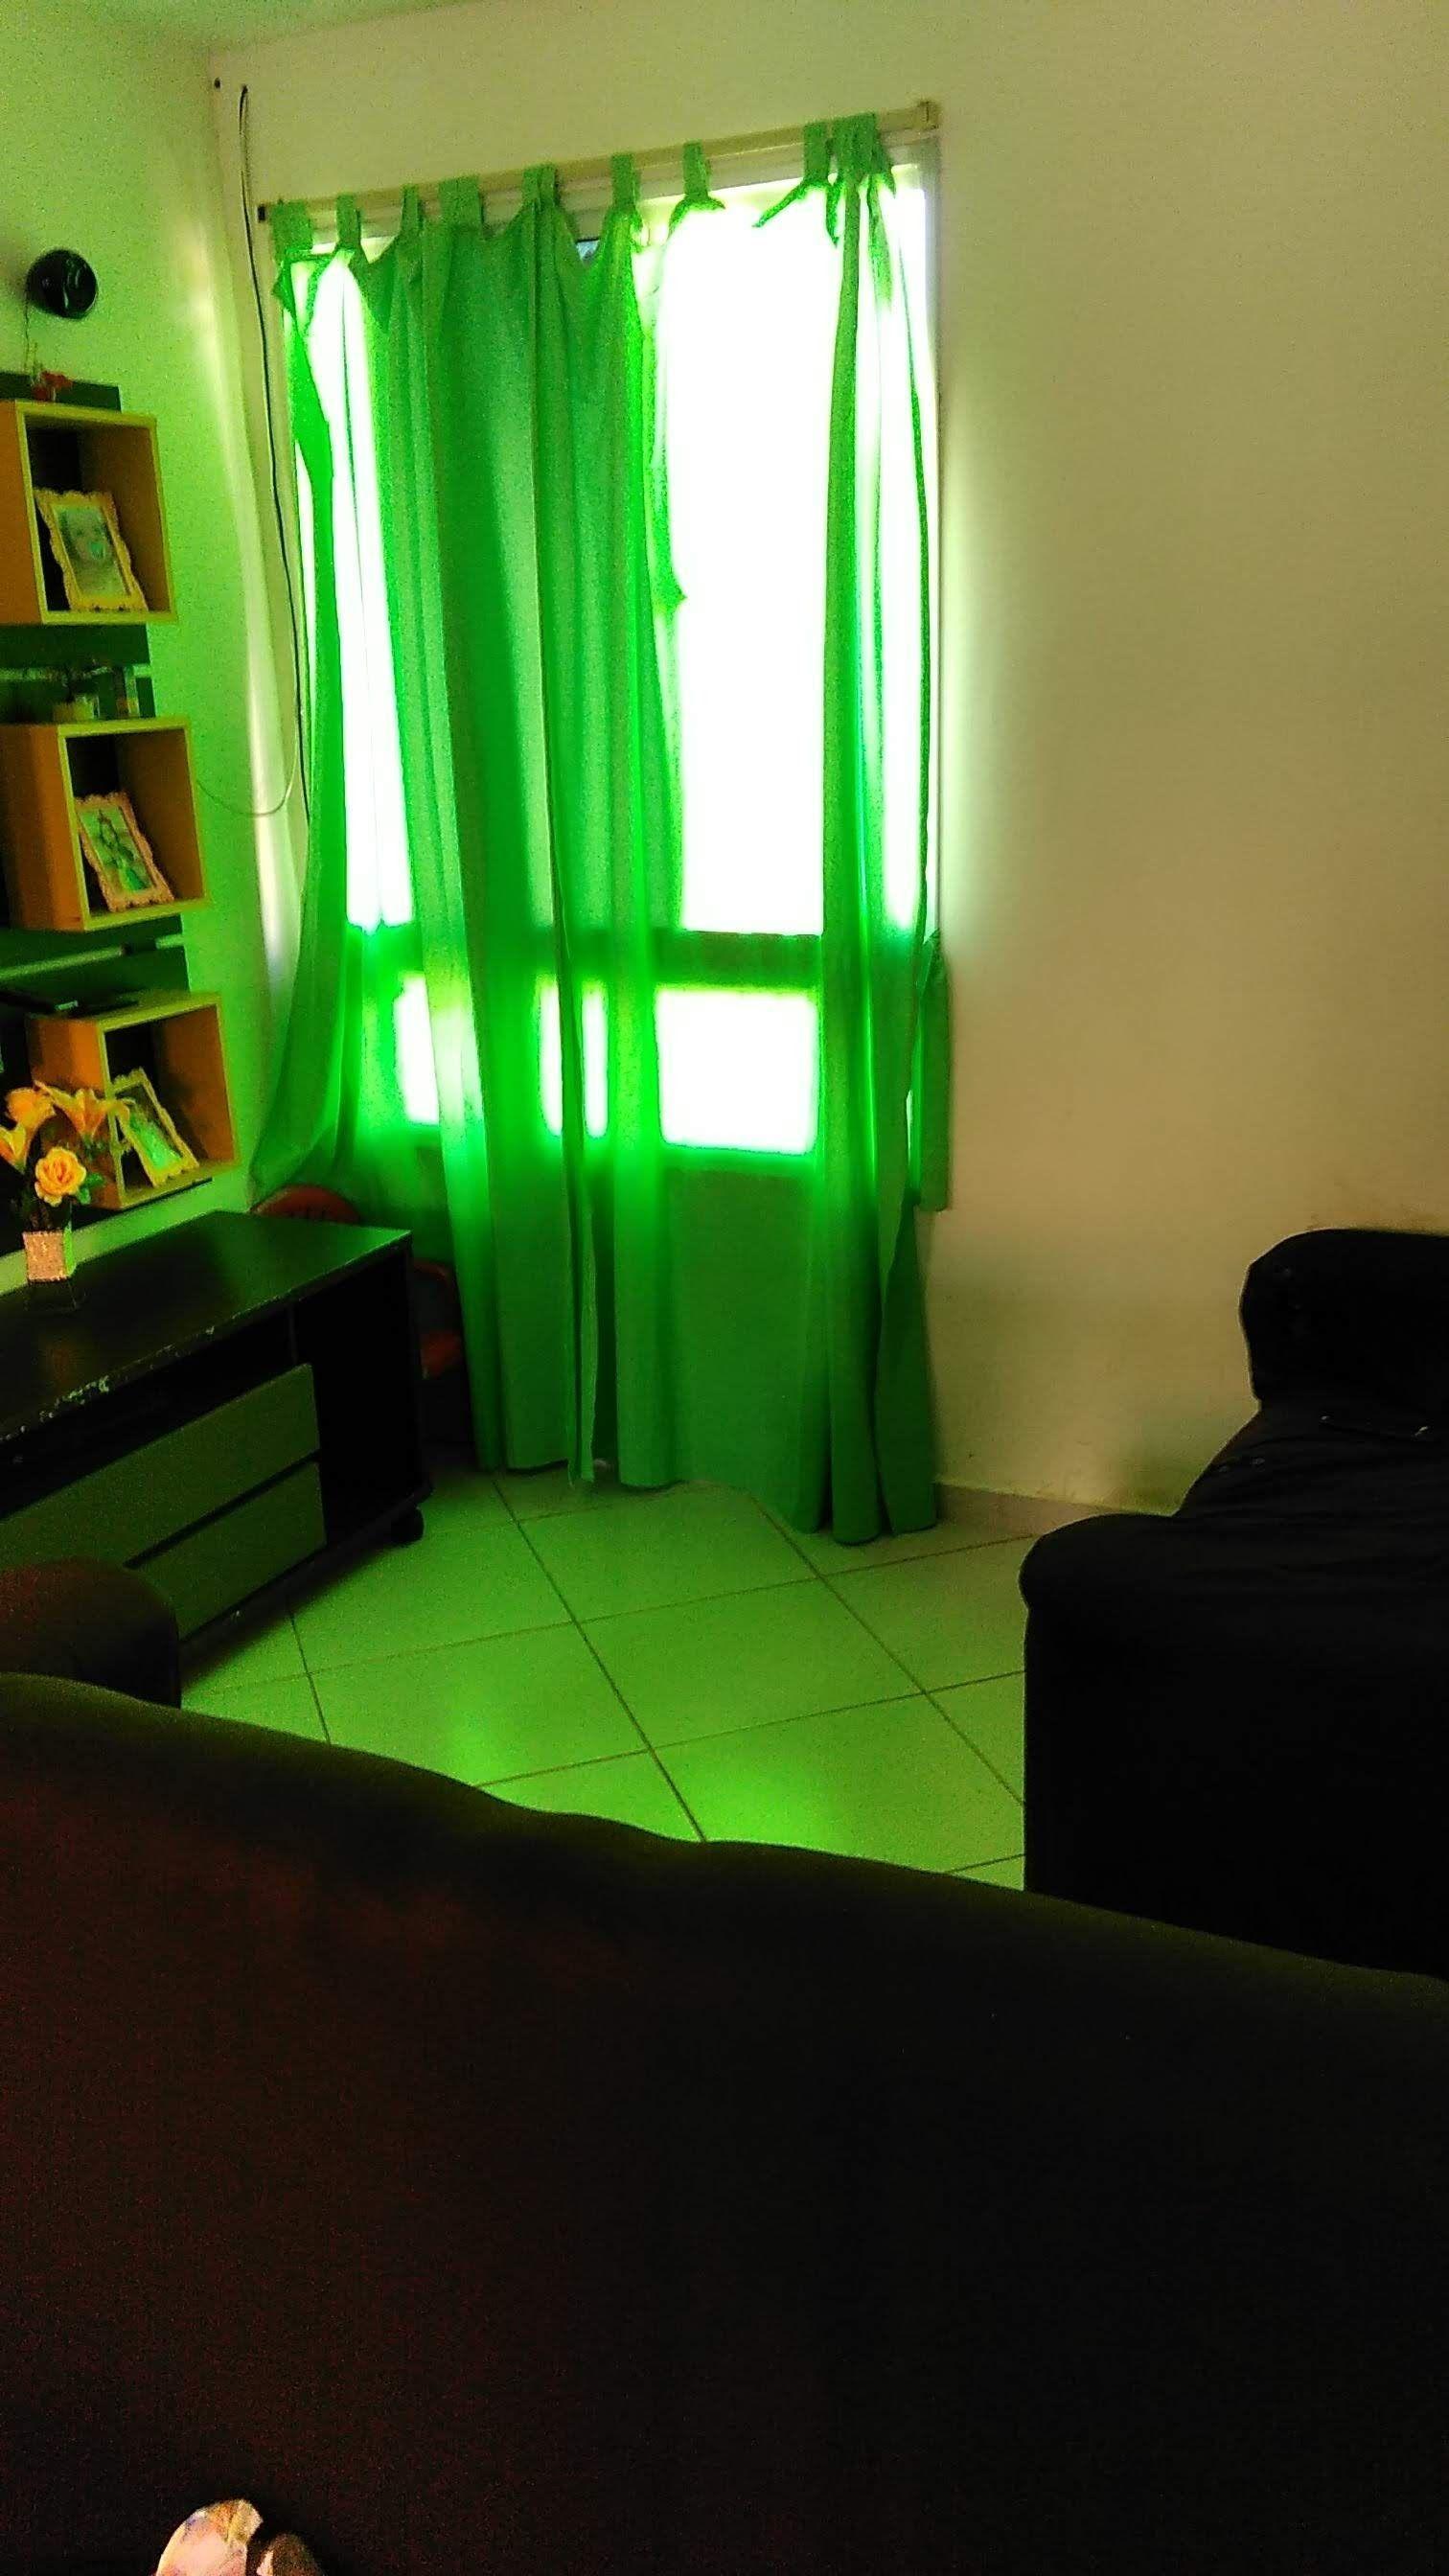 sala da cliente limpa